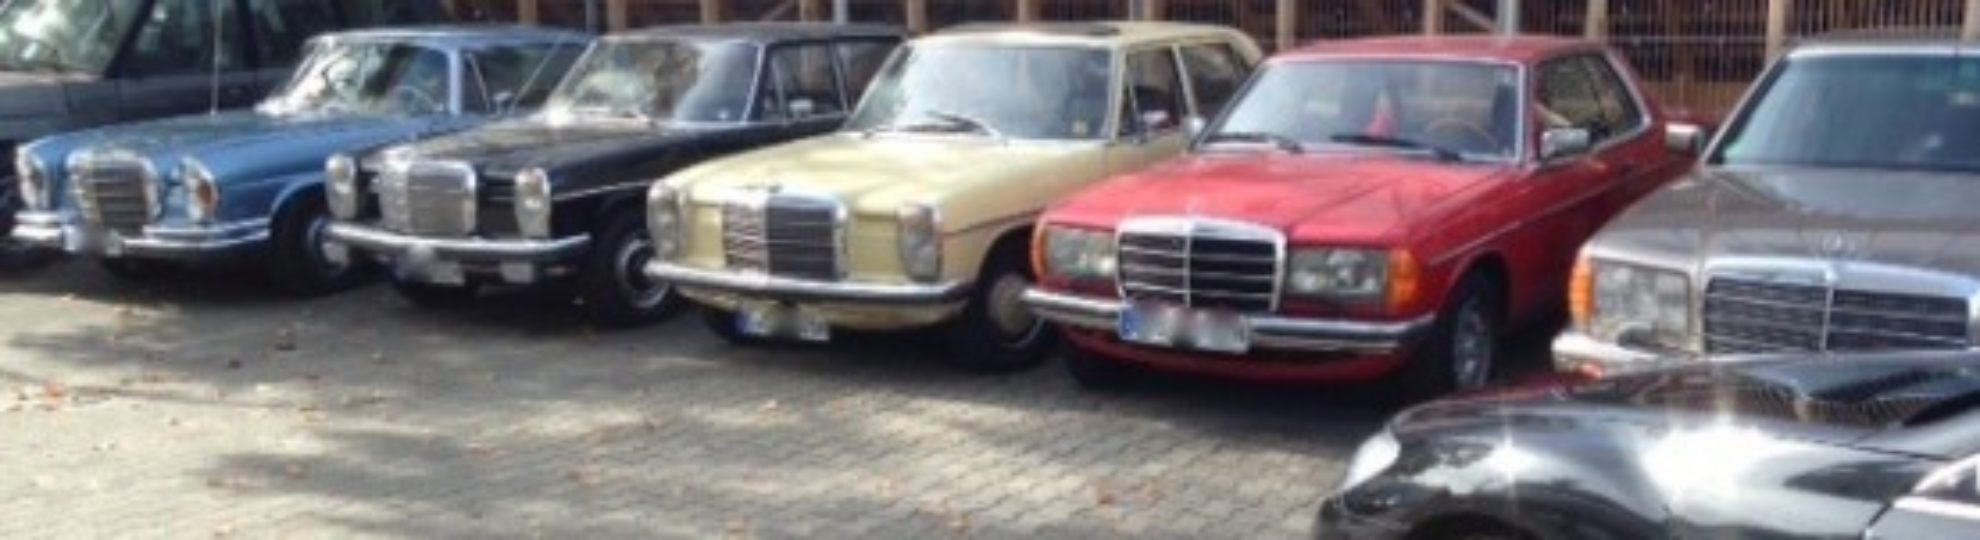 Auto verkaufen Berlin | Autoankauf